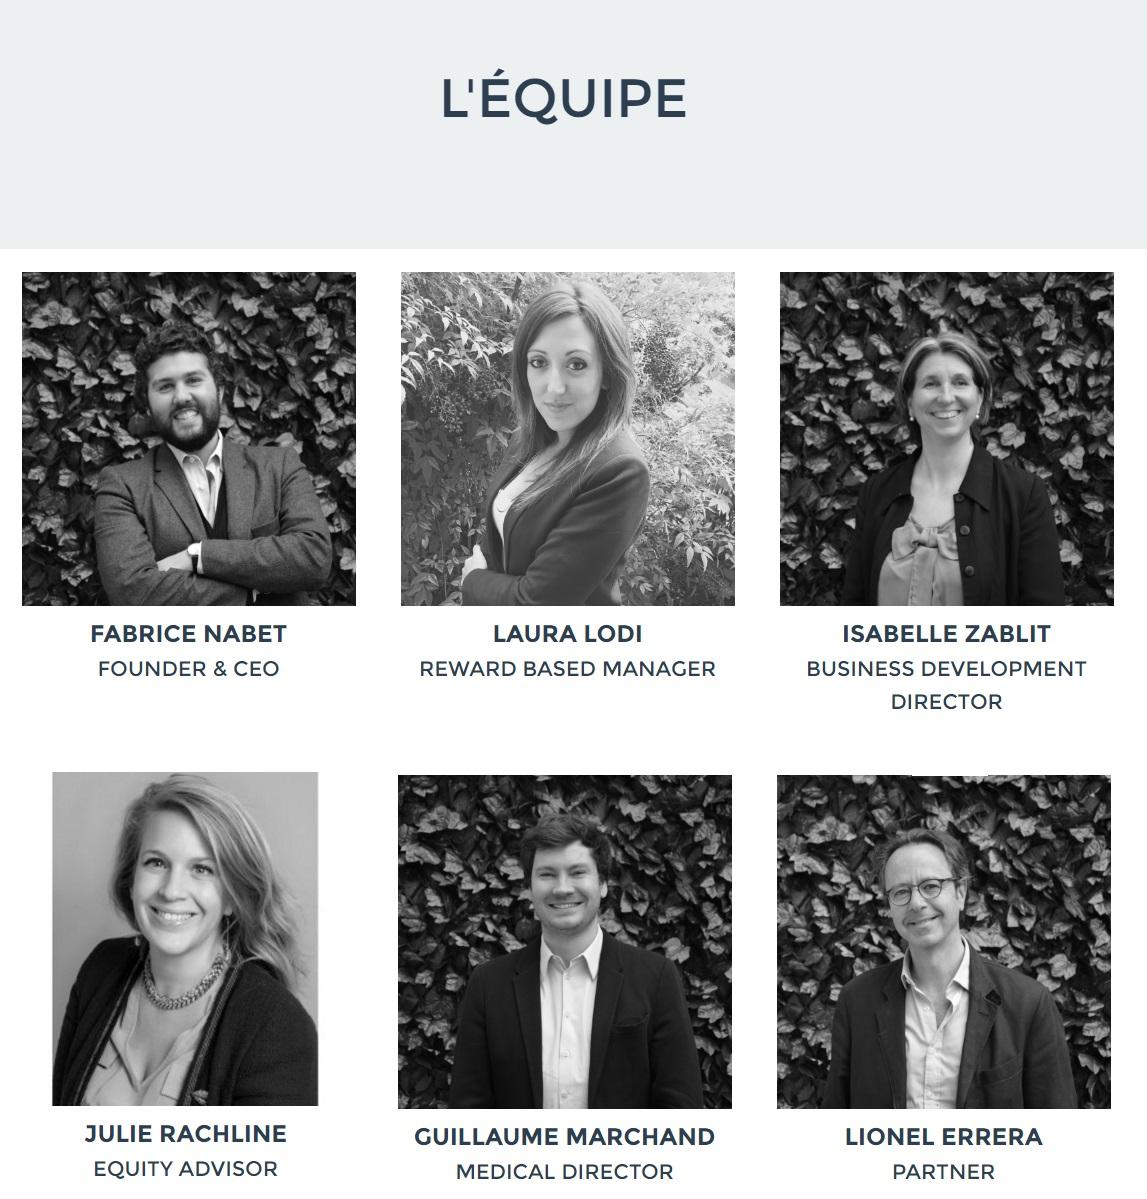 Equipe du site collaboratif Welfundr